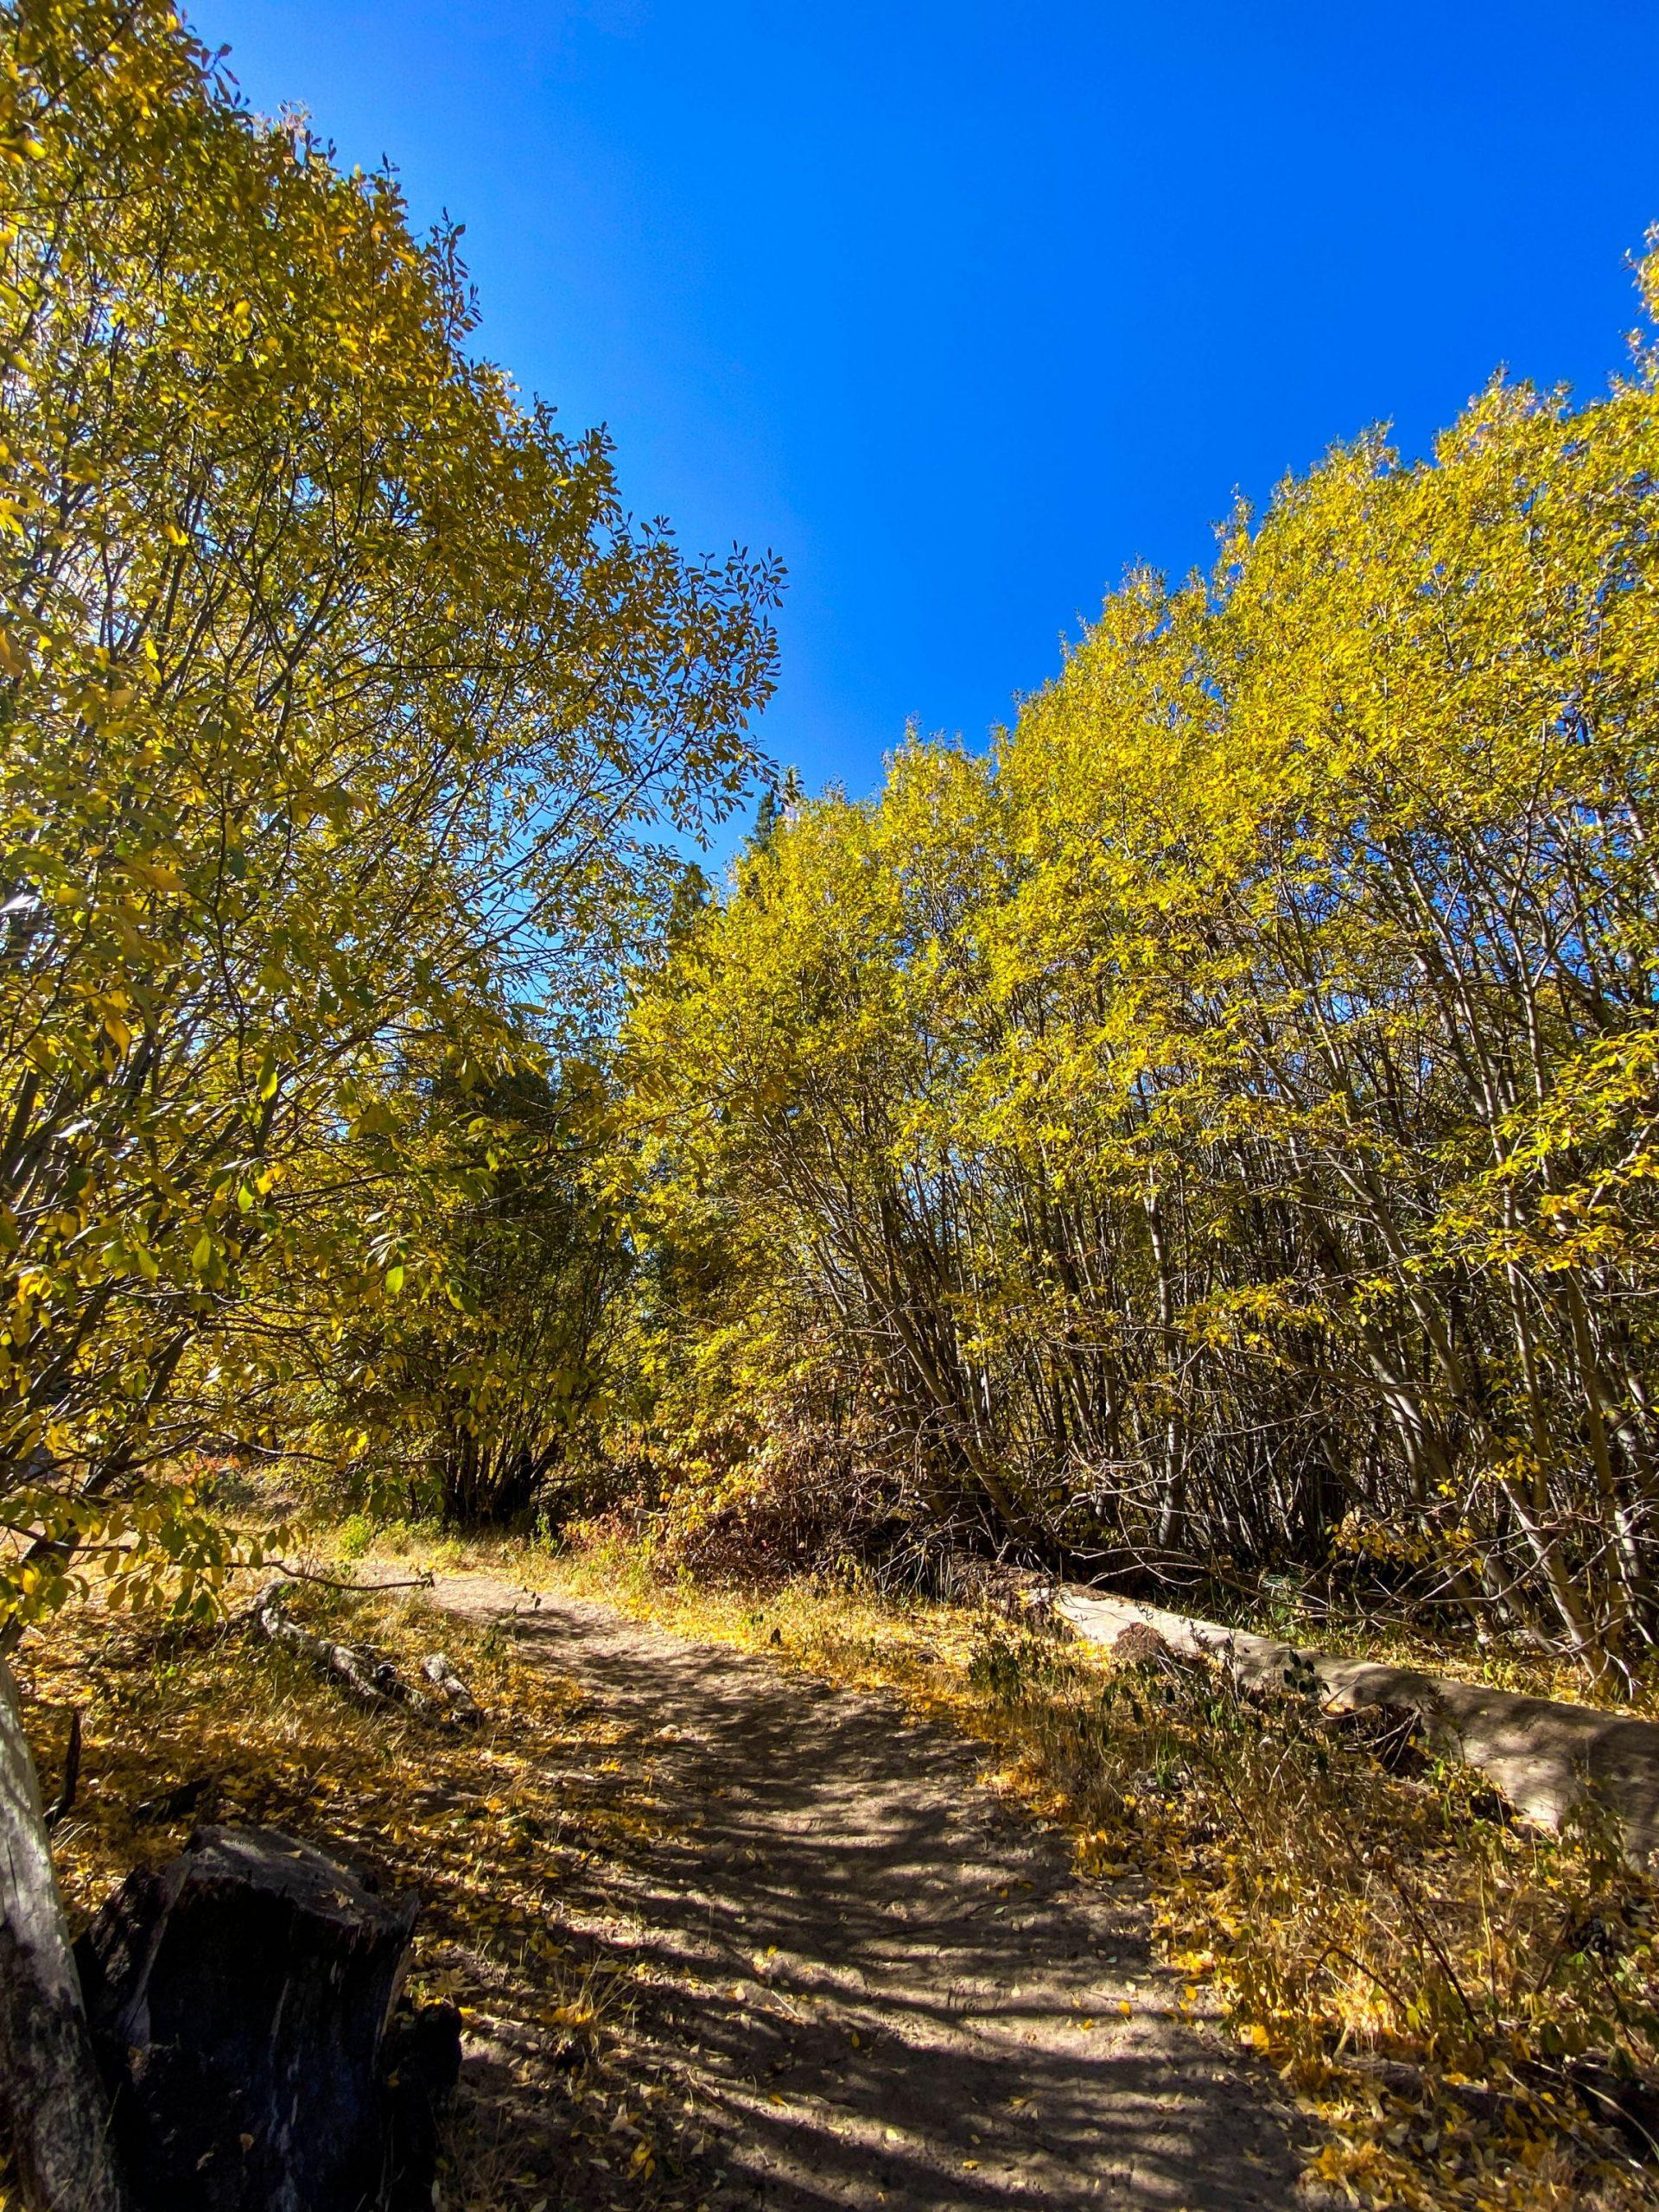 Gorgeous fall foliage at Van Sickle Bi-State Park.